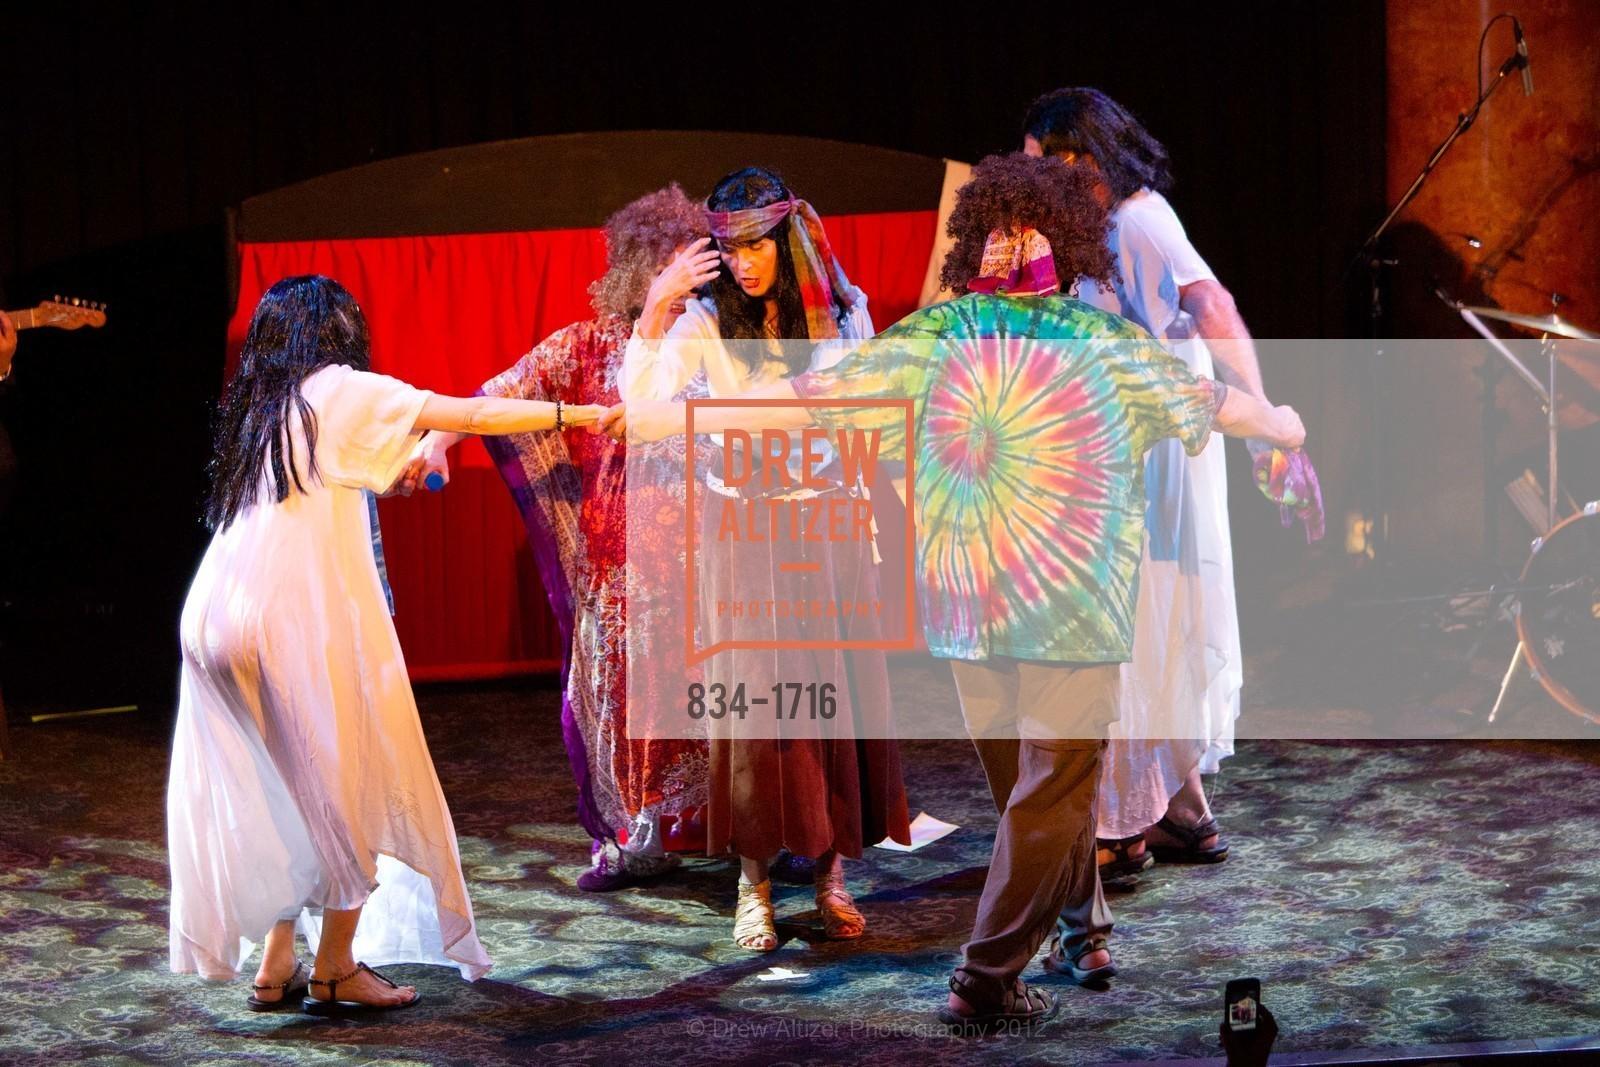 Performance, Photo #834-1716